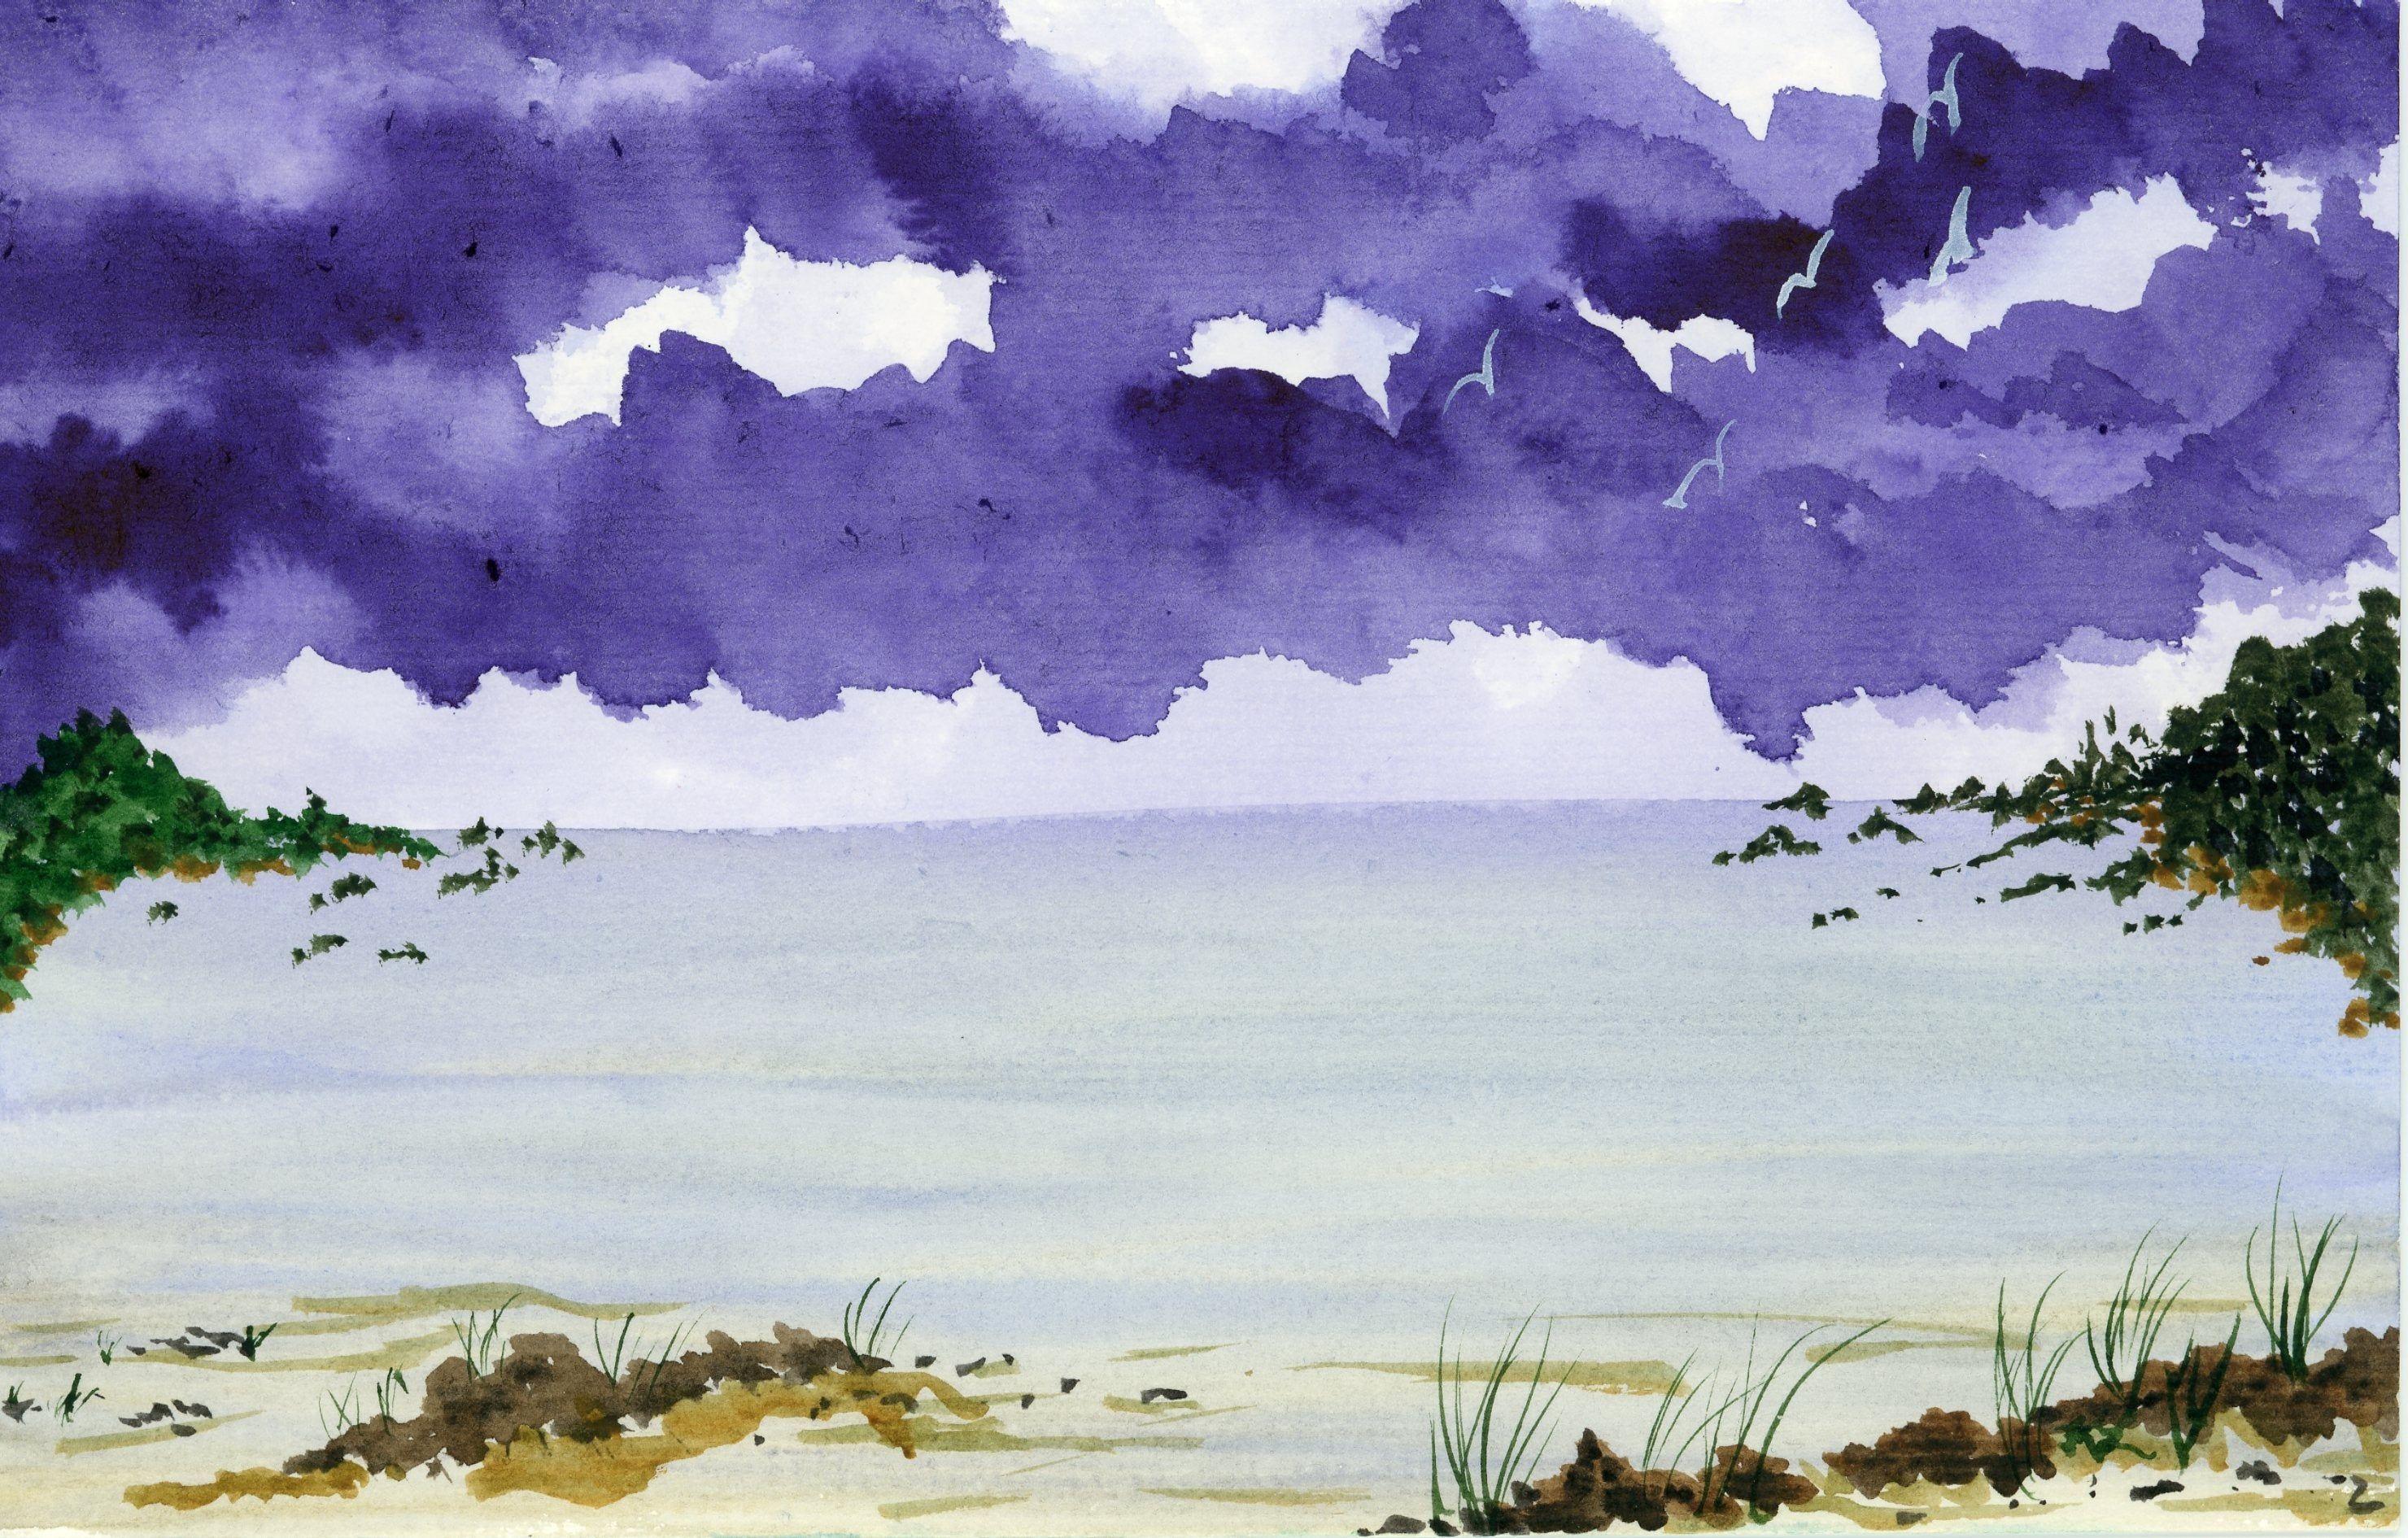 New Watercolor Landscape Purple Clouds 5 5x8 5 Inch Original Not A Print Hand Painted Seascape Cove Ocean Seagulls Sand Rocks Sea Grass Watercolor Landscape Clouds Landscape